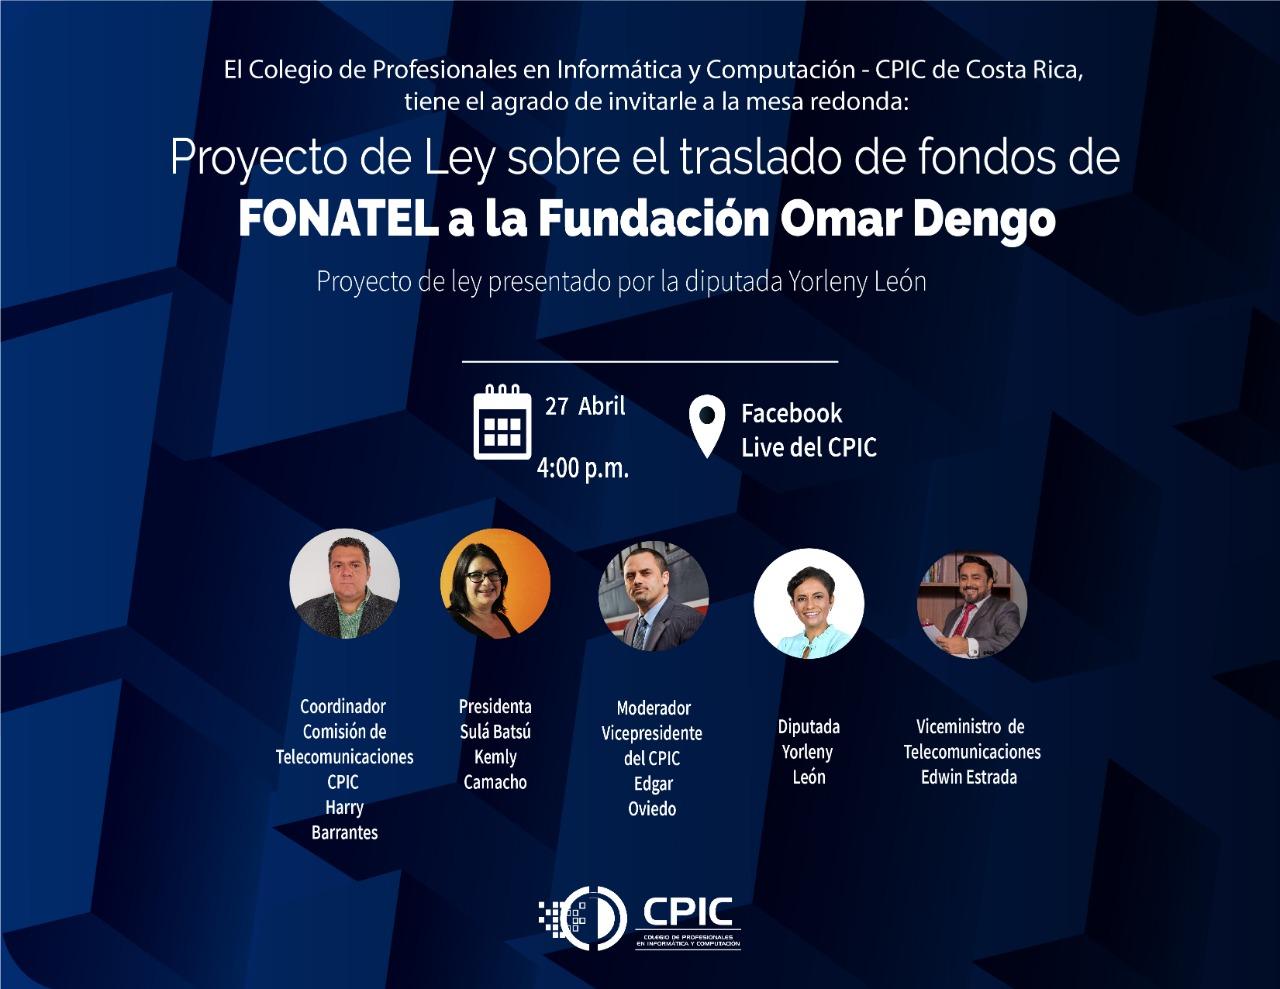 El CPIC organiza exitosa mesa redonda